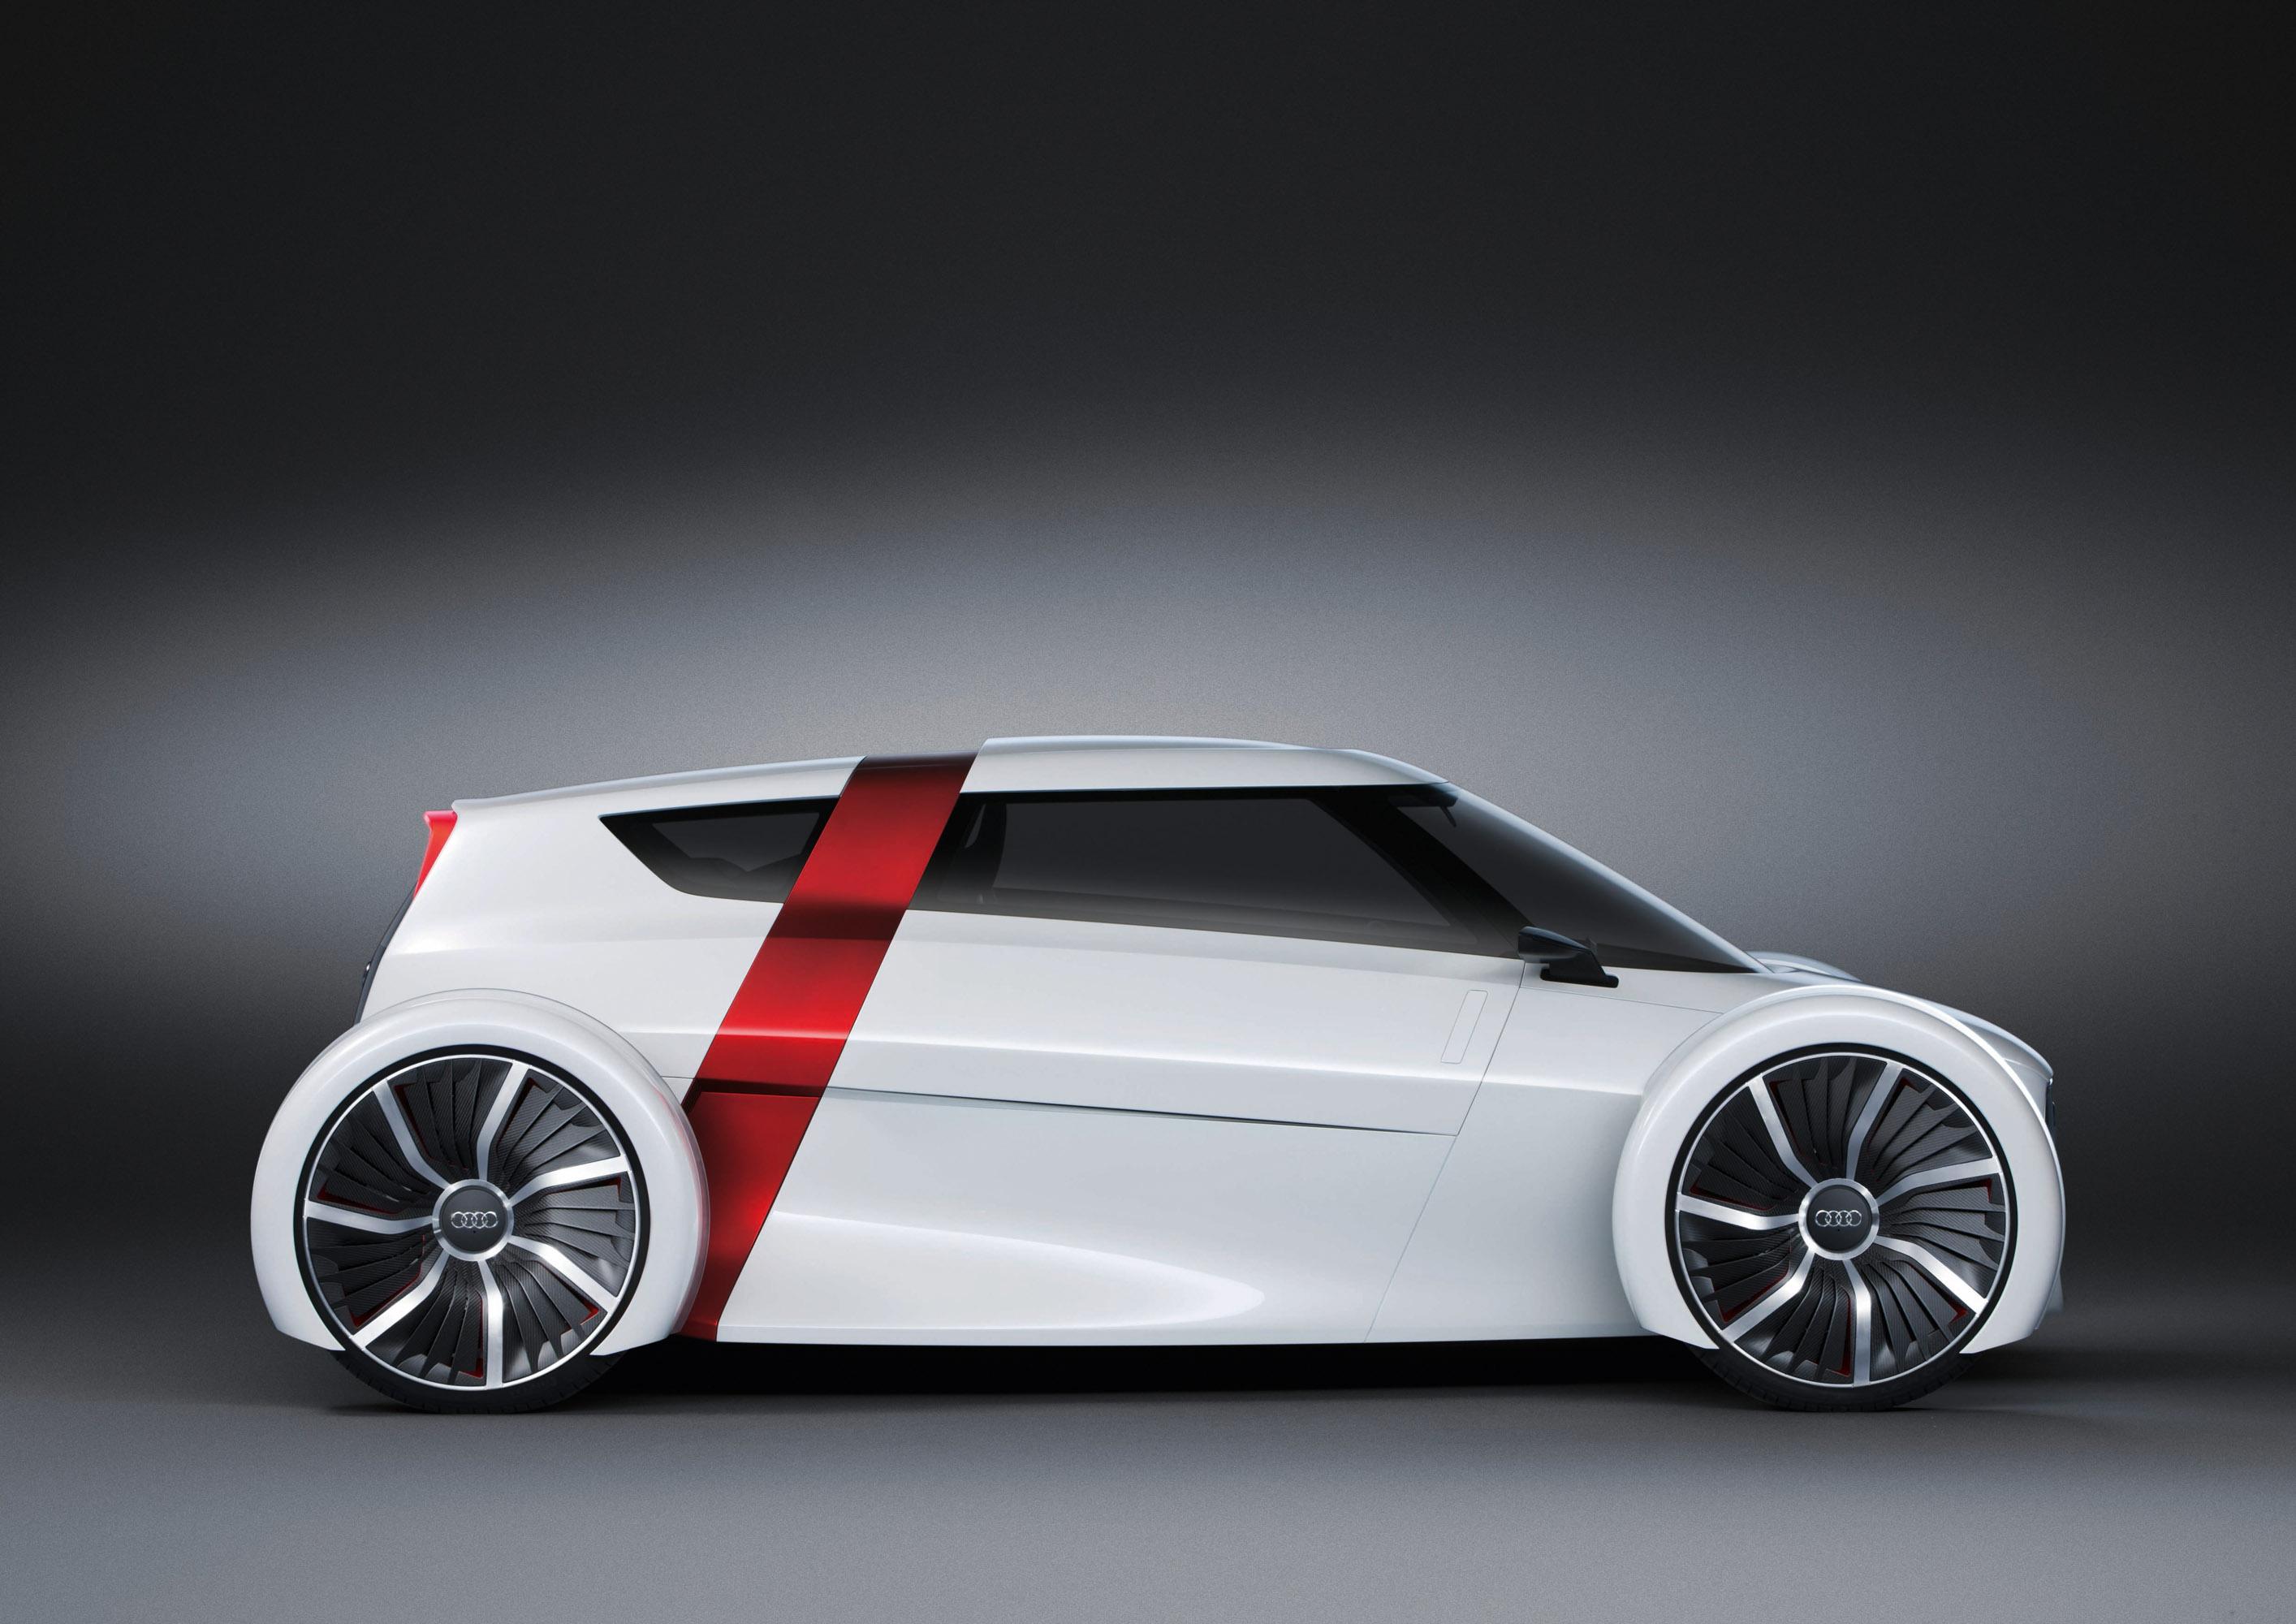 Audi Urban Concept Spyder - Picture 58192